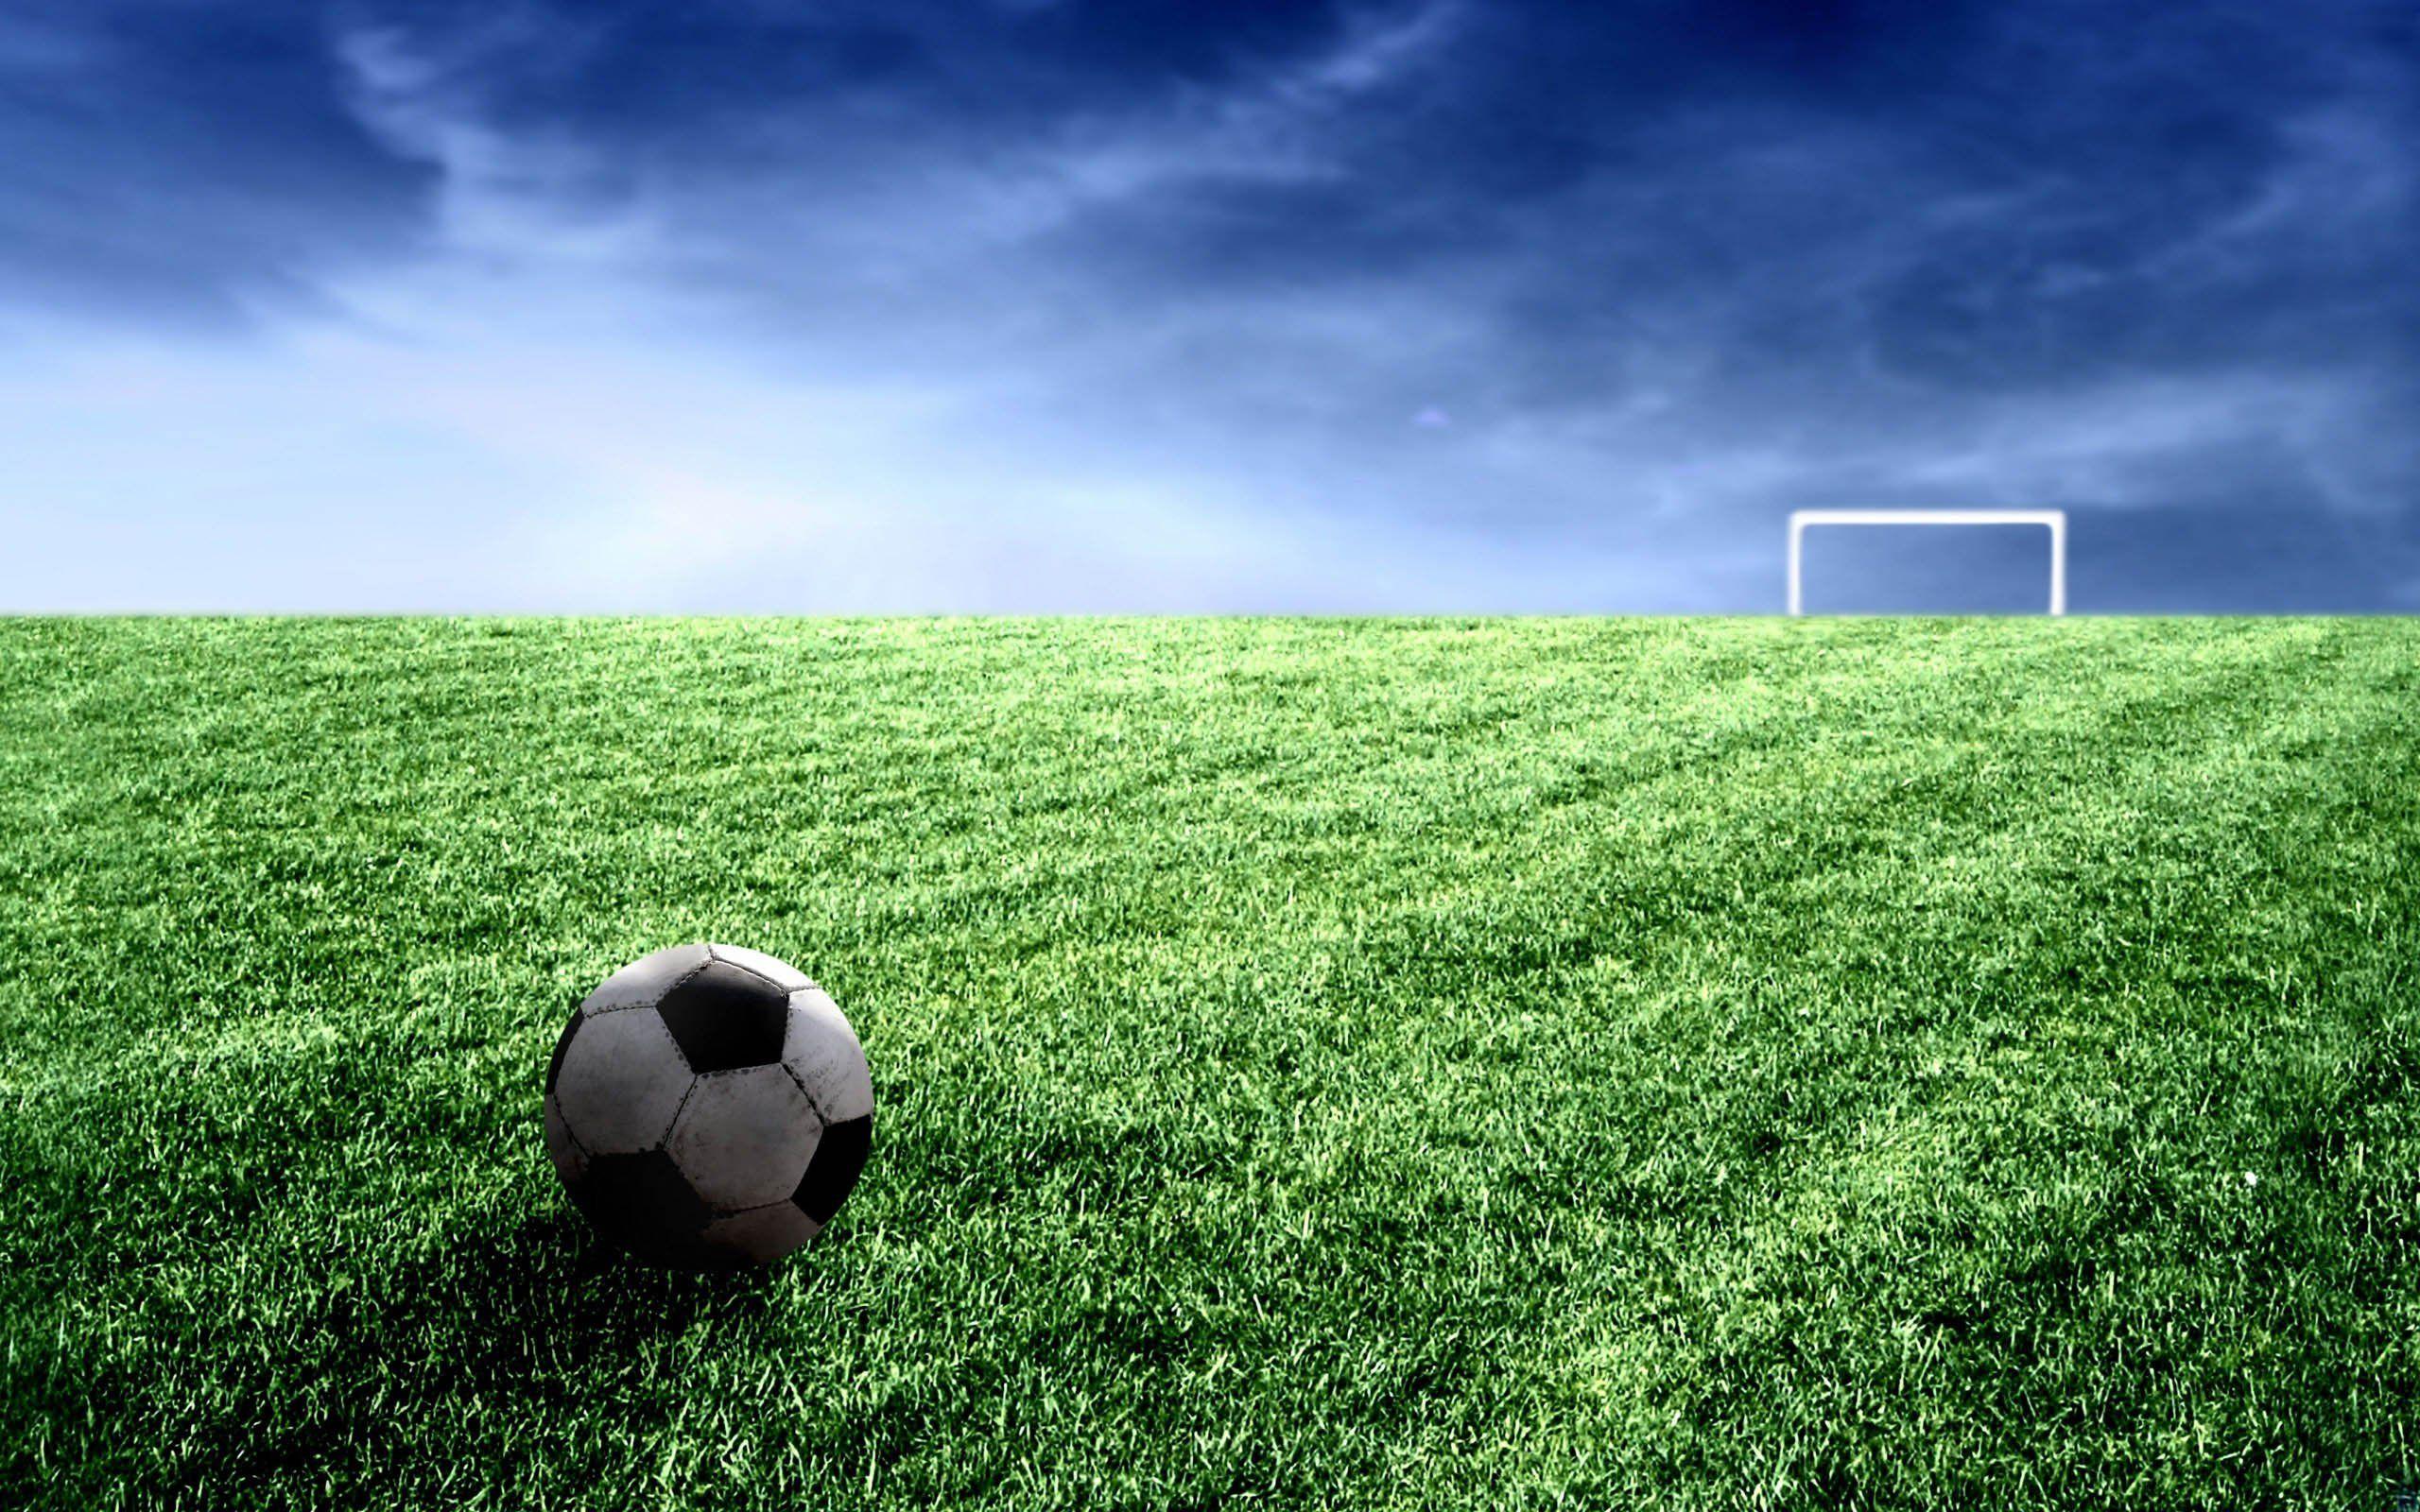 Soccer Field Grass Wallpaper images  Hdimagelib